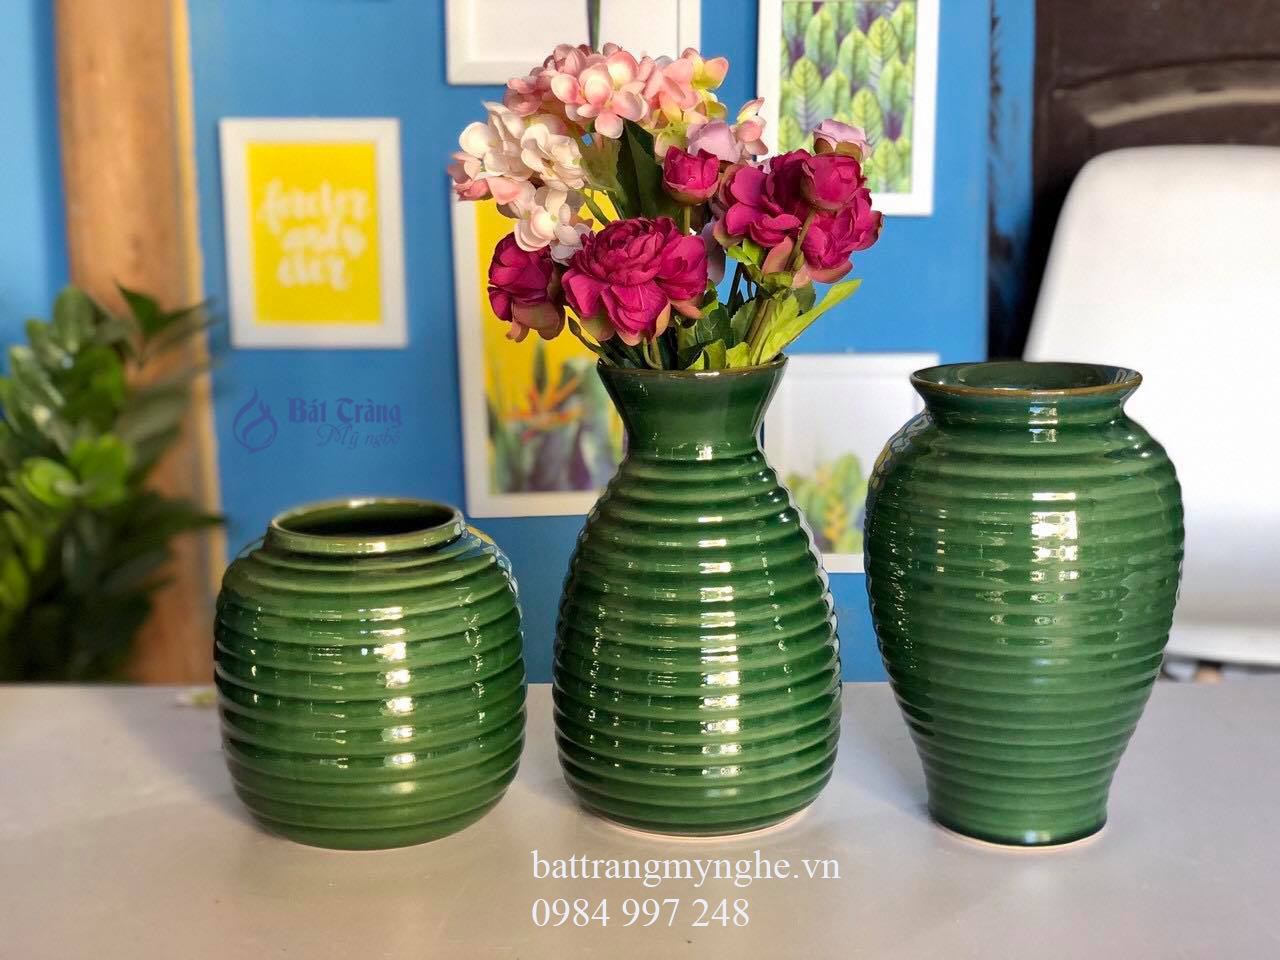 Bộ ba lọ hoa anh em mẫu 2 men xanh lá cây